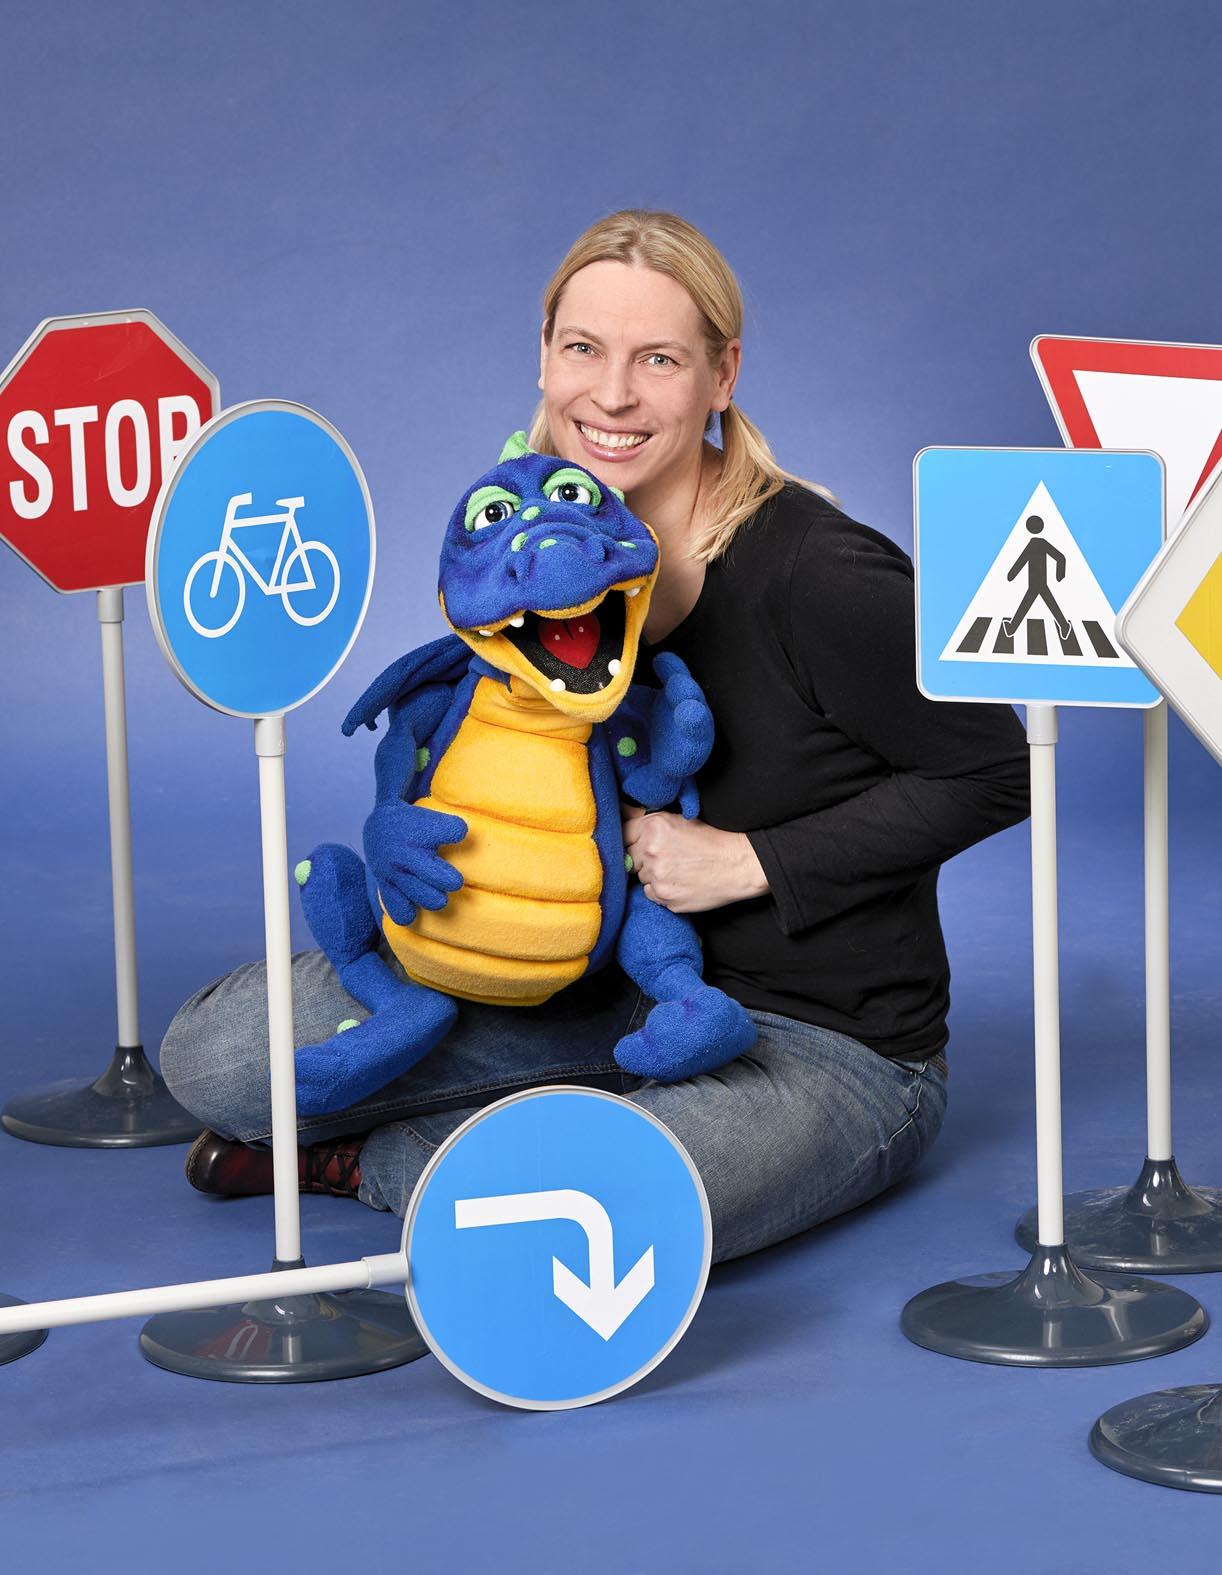 Tijo Kinderbuch - Neu: Verkehrsprogramm mit Valentin